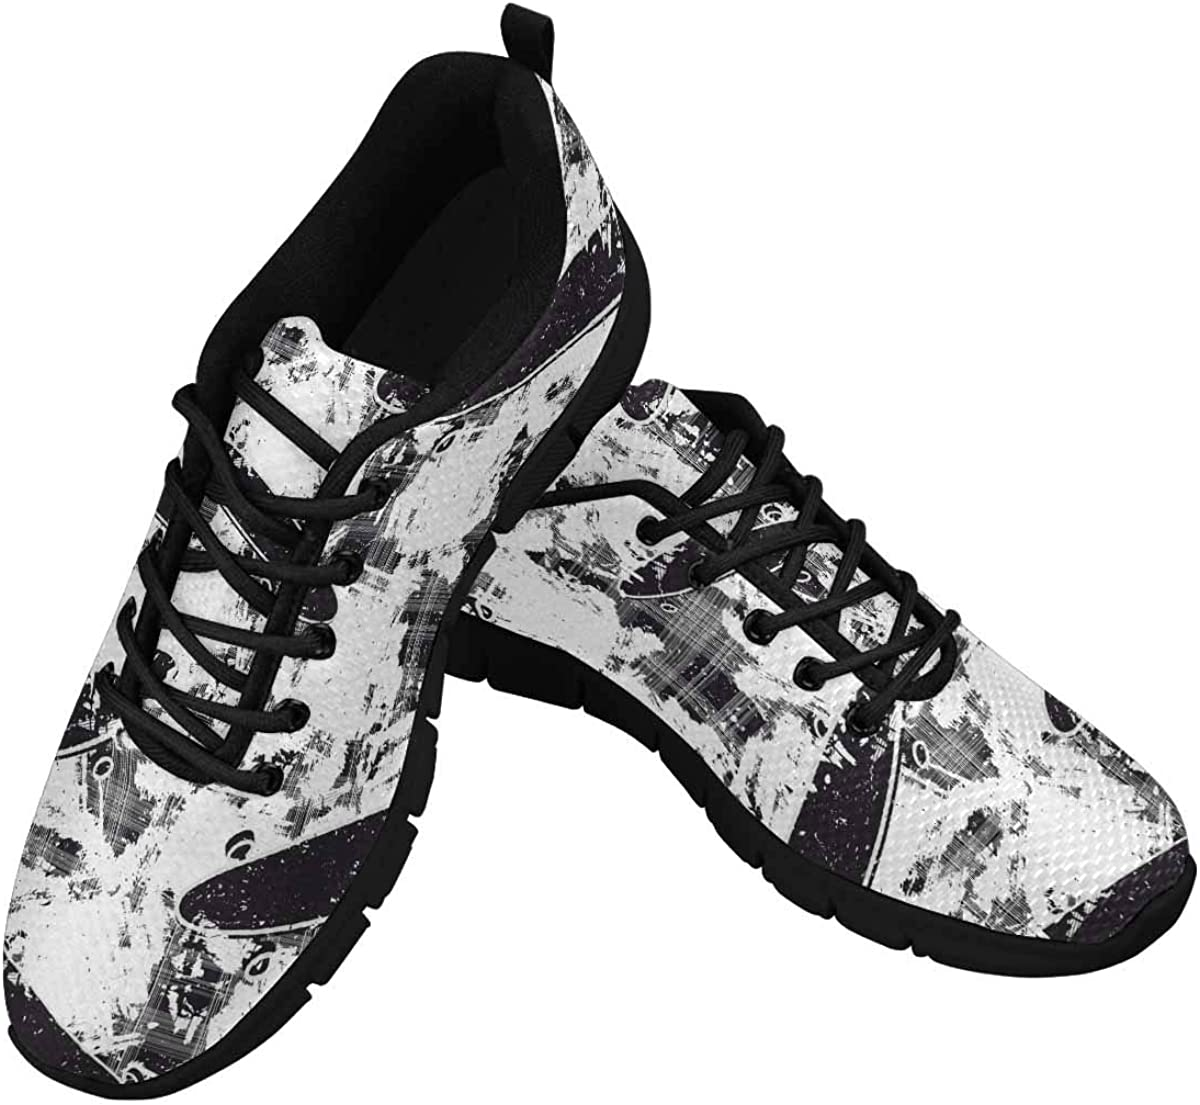 InterestPrint Skateboards Background Women's Athletic Walking Running Sneakers Comfortable Lightweight Shoes